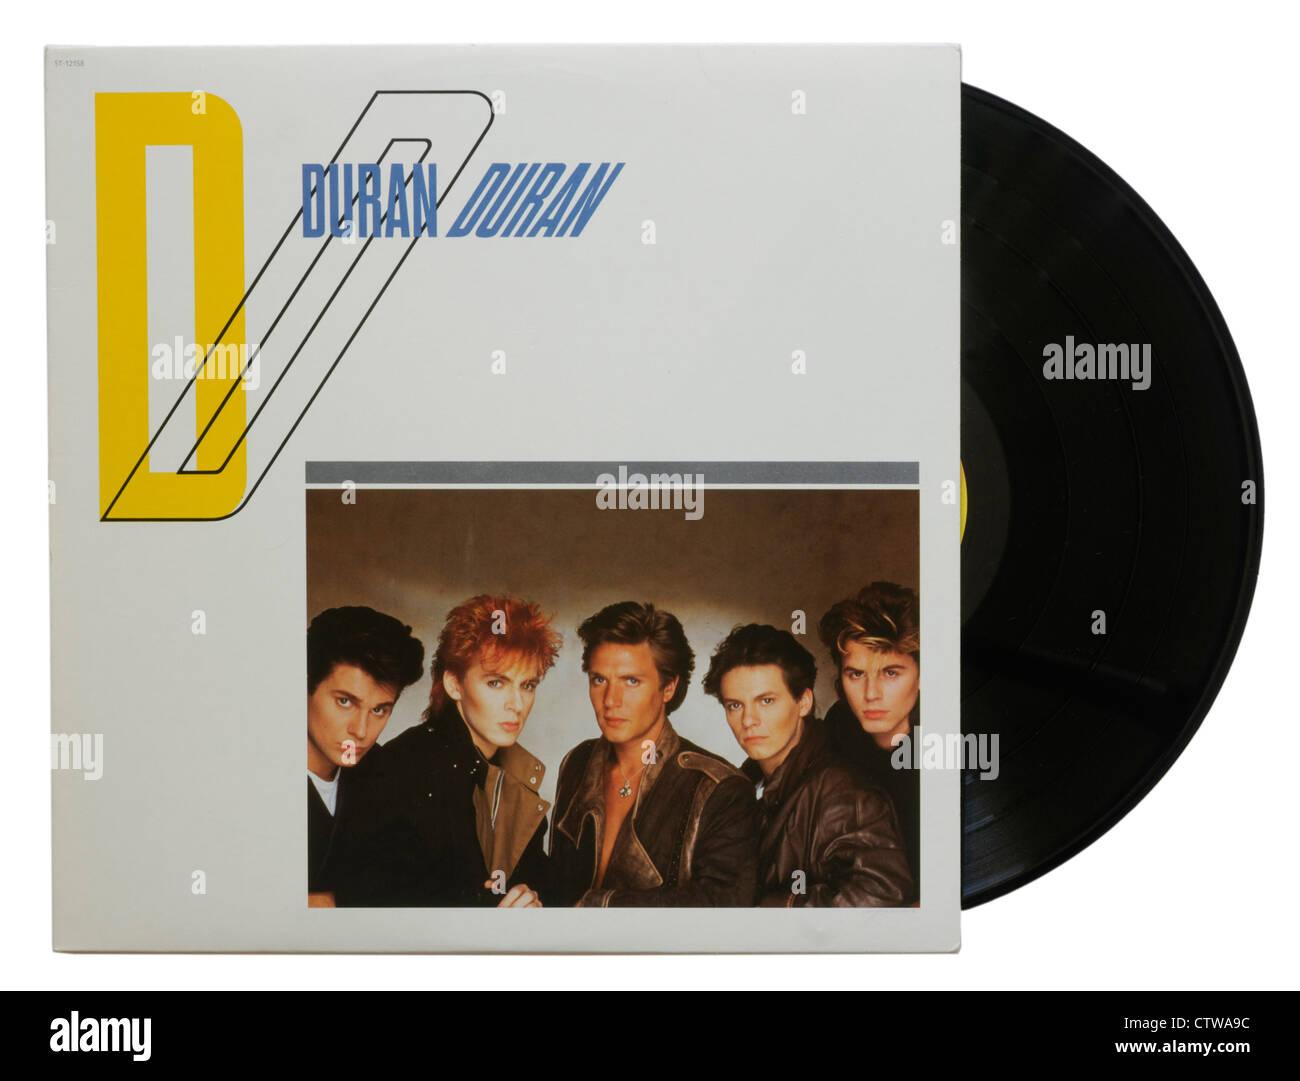 Duran Duran's first album - Stock Image